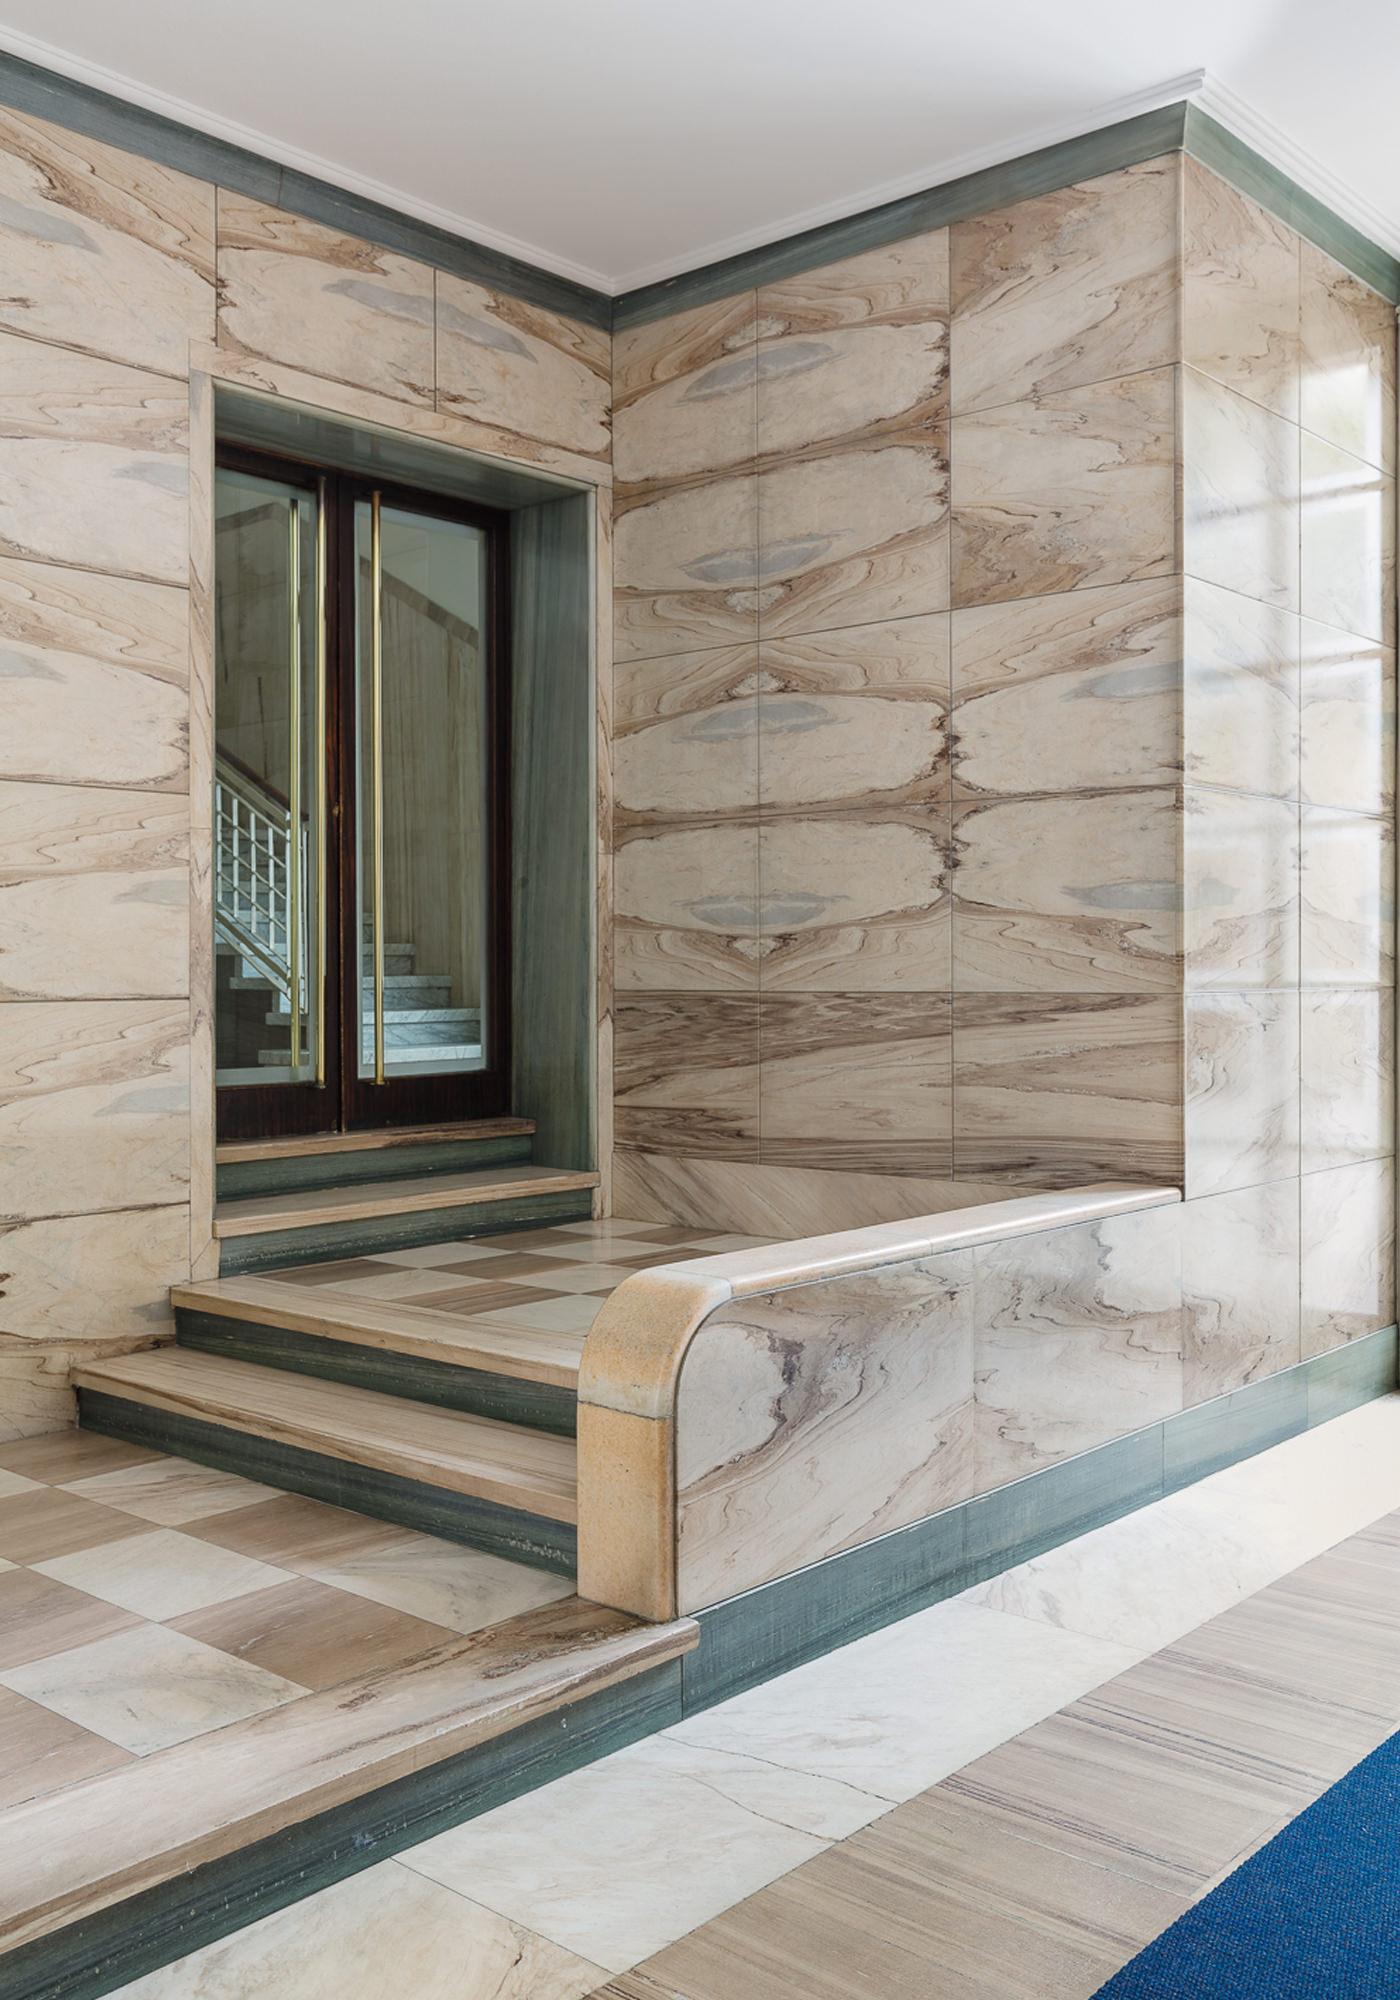 Milan Design Architecture